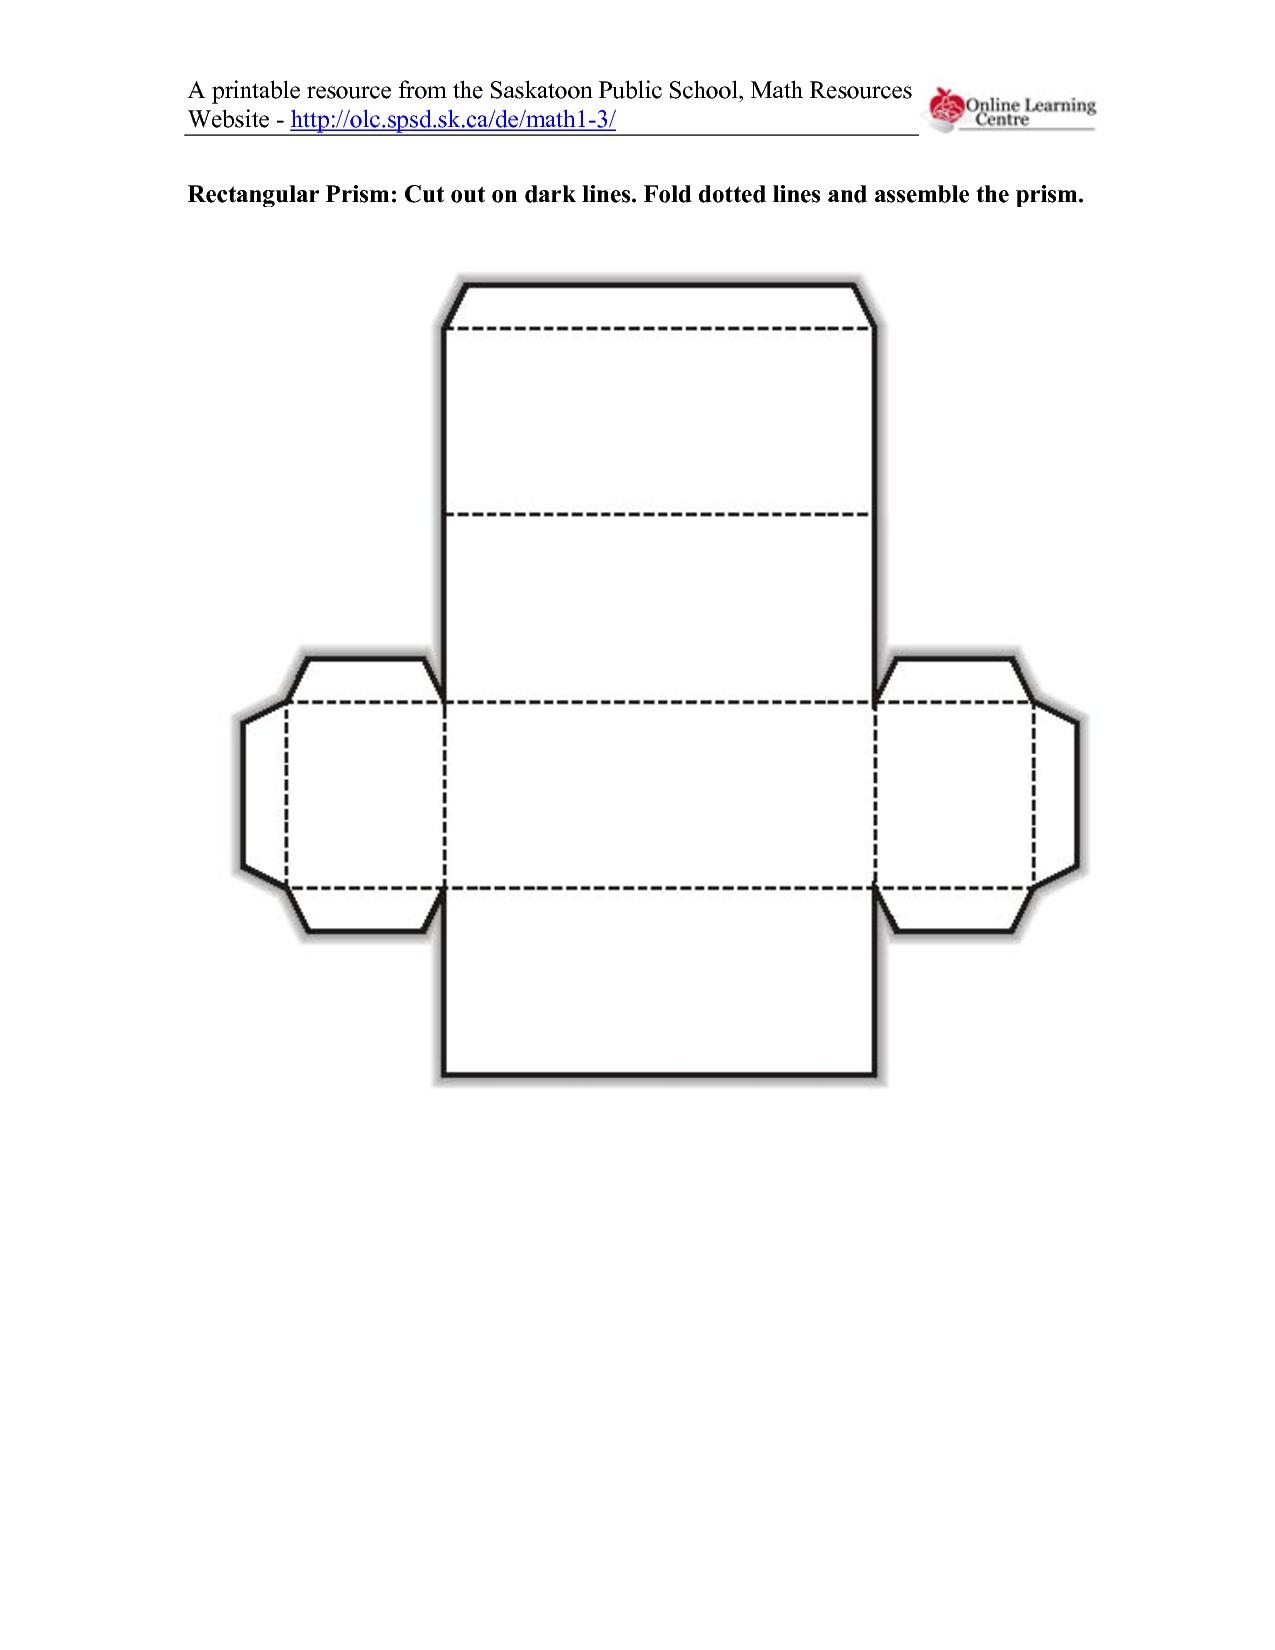 5 Images of Rectangular Prism Printable